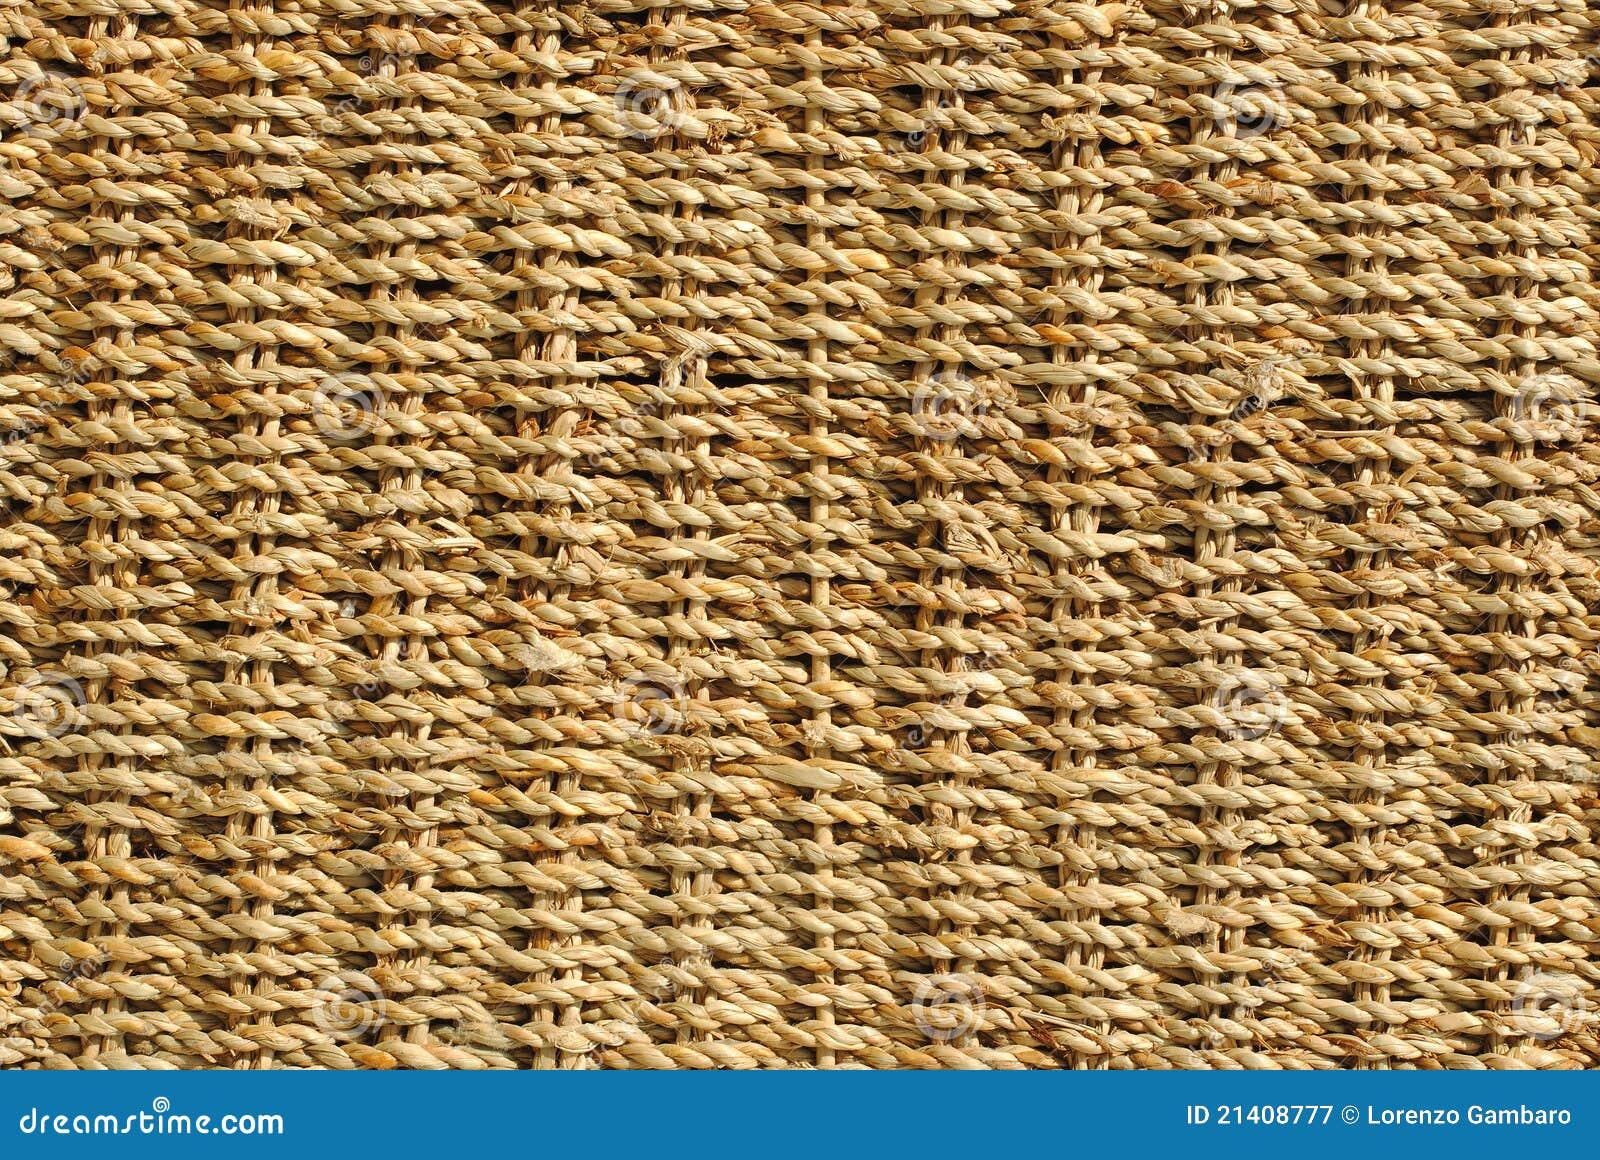 Wicker Basket With Original Pattern Royalty Free Stock